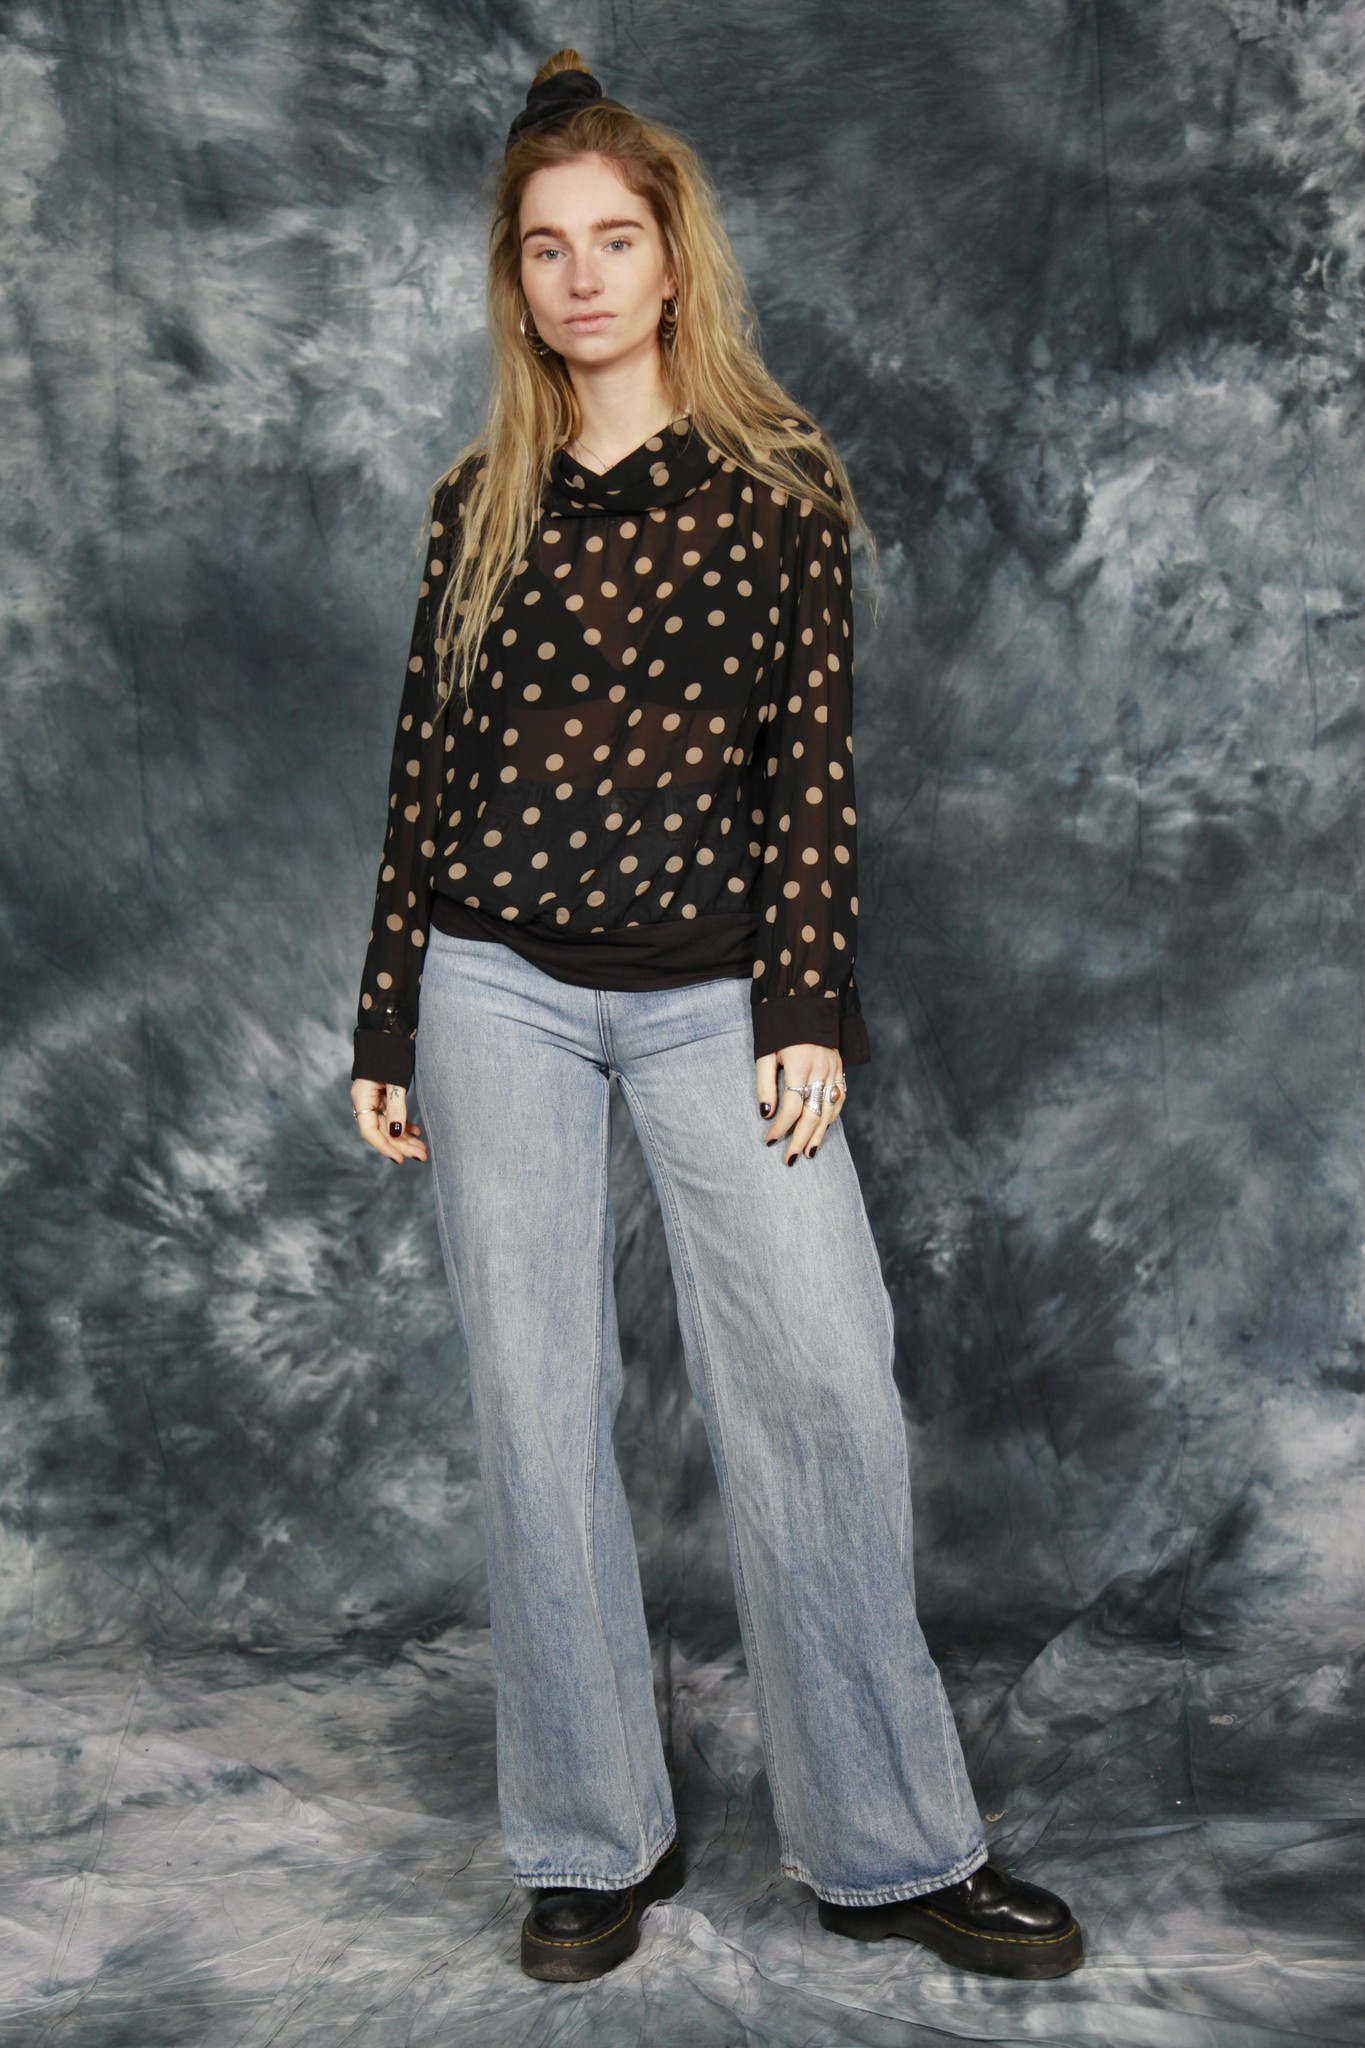 Black 90s blouse